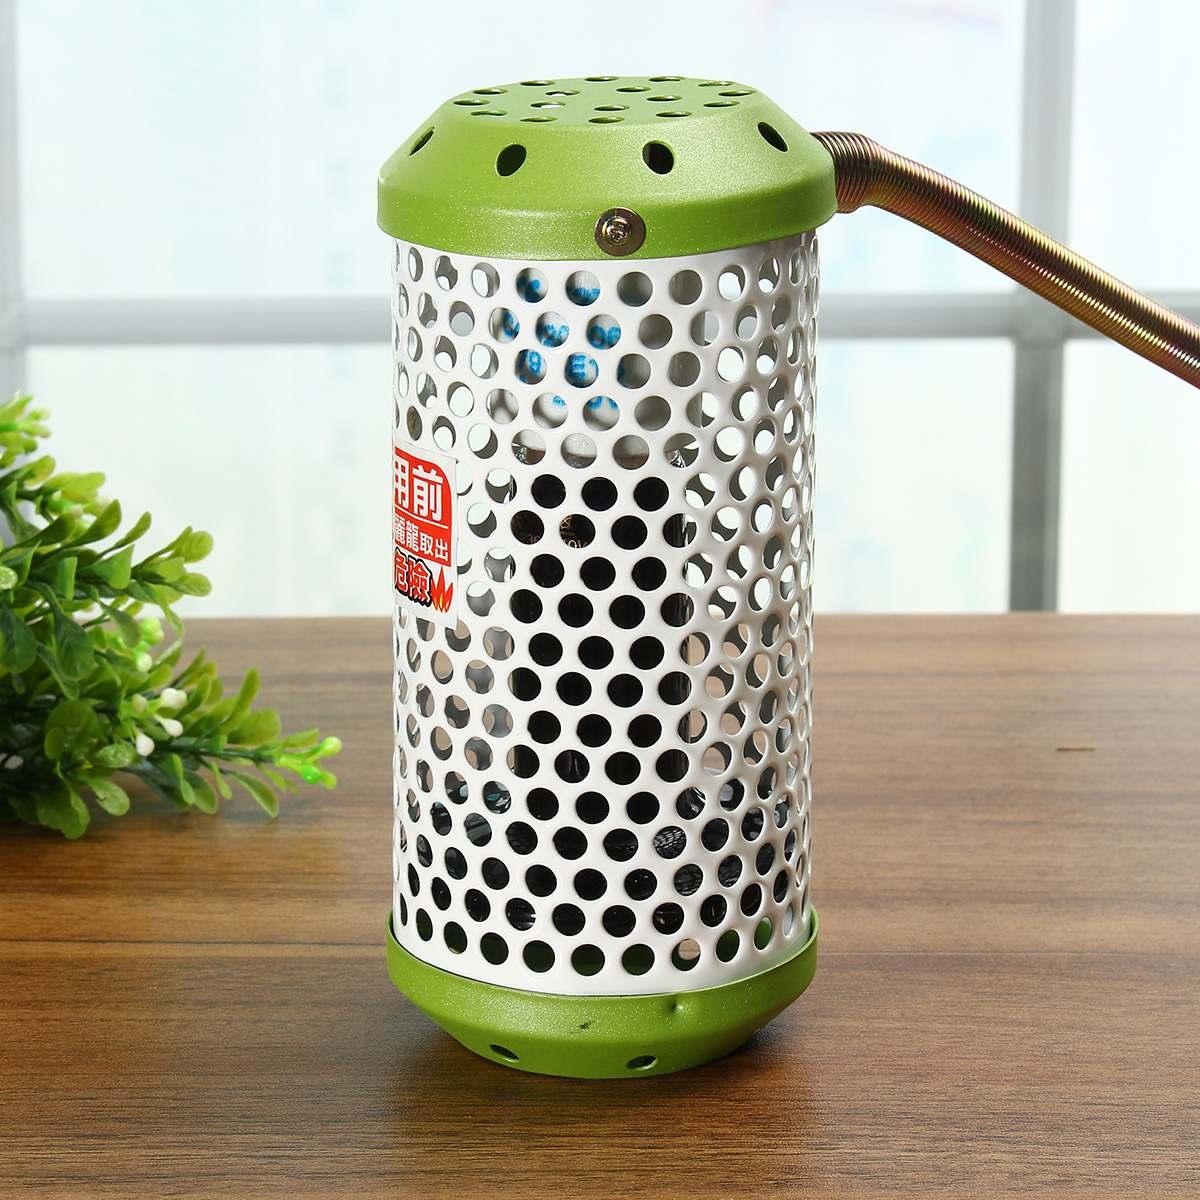 Lámpara de calefacción para mascotas de 20 W, luz de cerámica infrarroja con emisor de jaula de seguridad, lámpara de calor para mascotas, suministros de pollos, lámpara para reptiles de 110 v-230 V